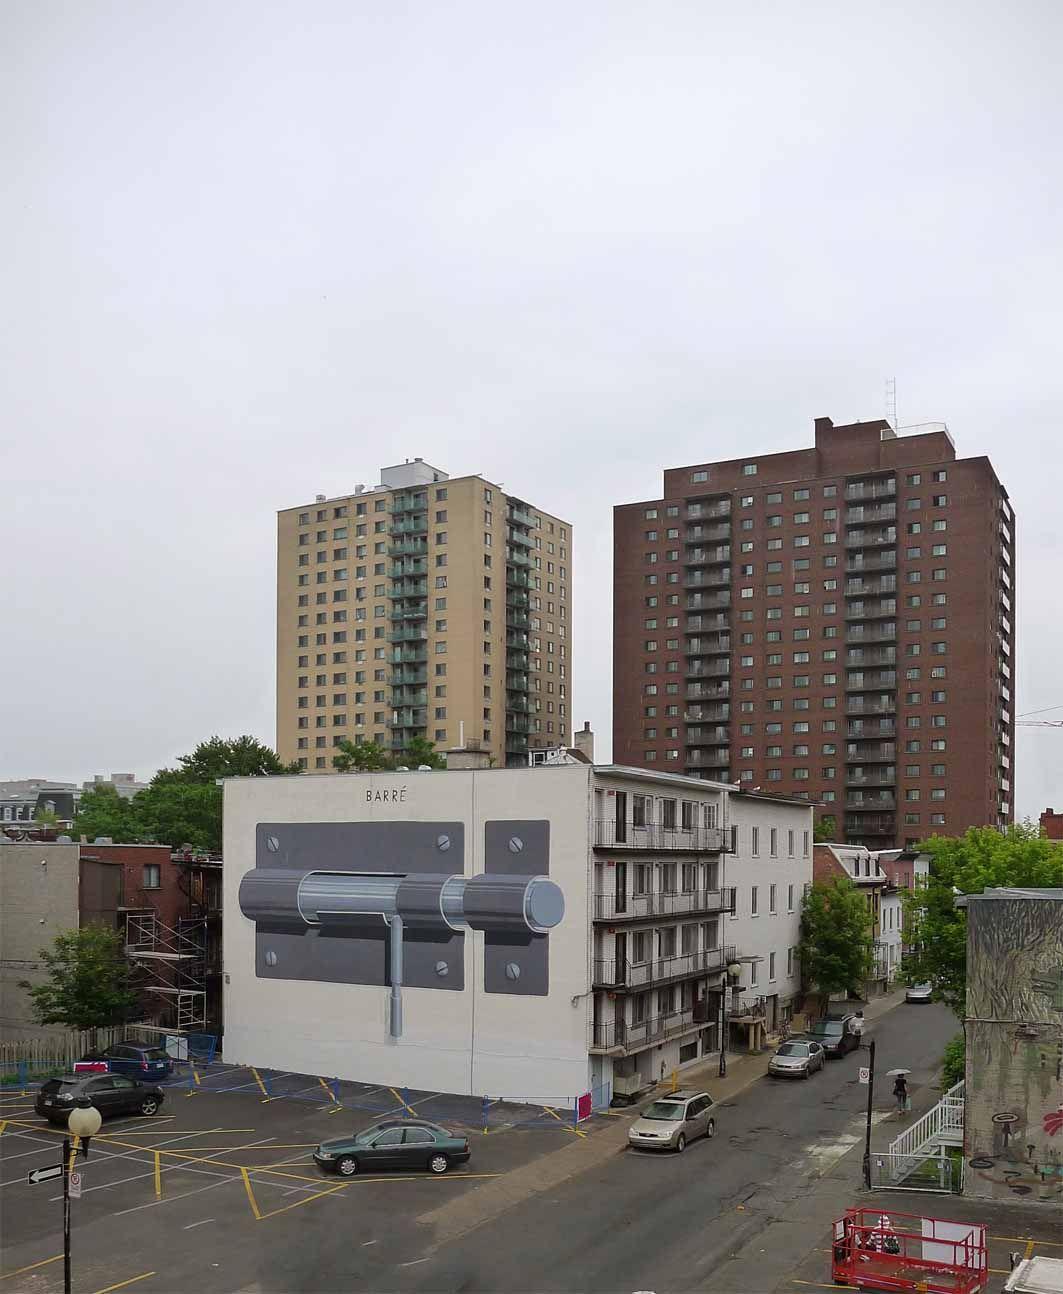 Ecsif — Lock (Montreal)